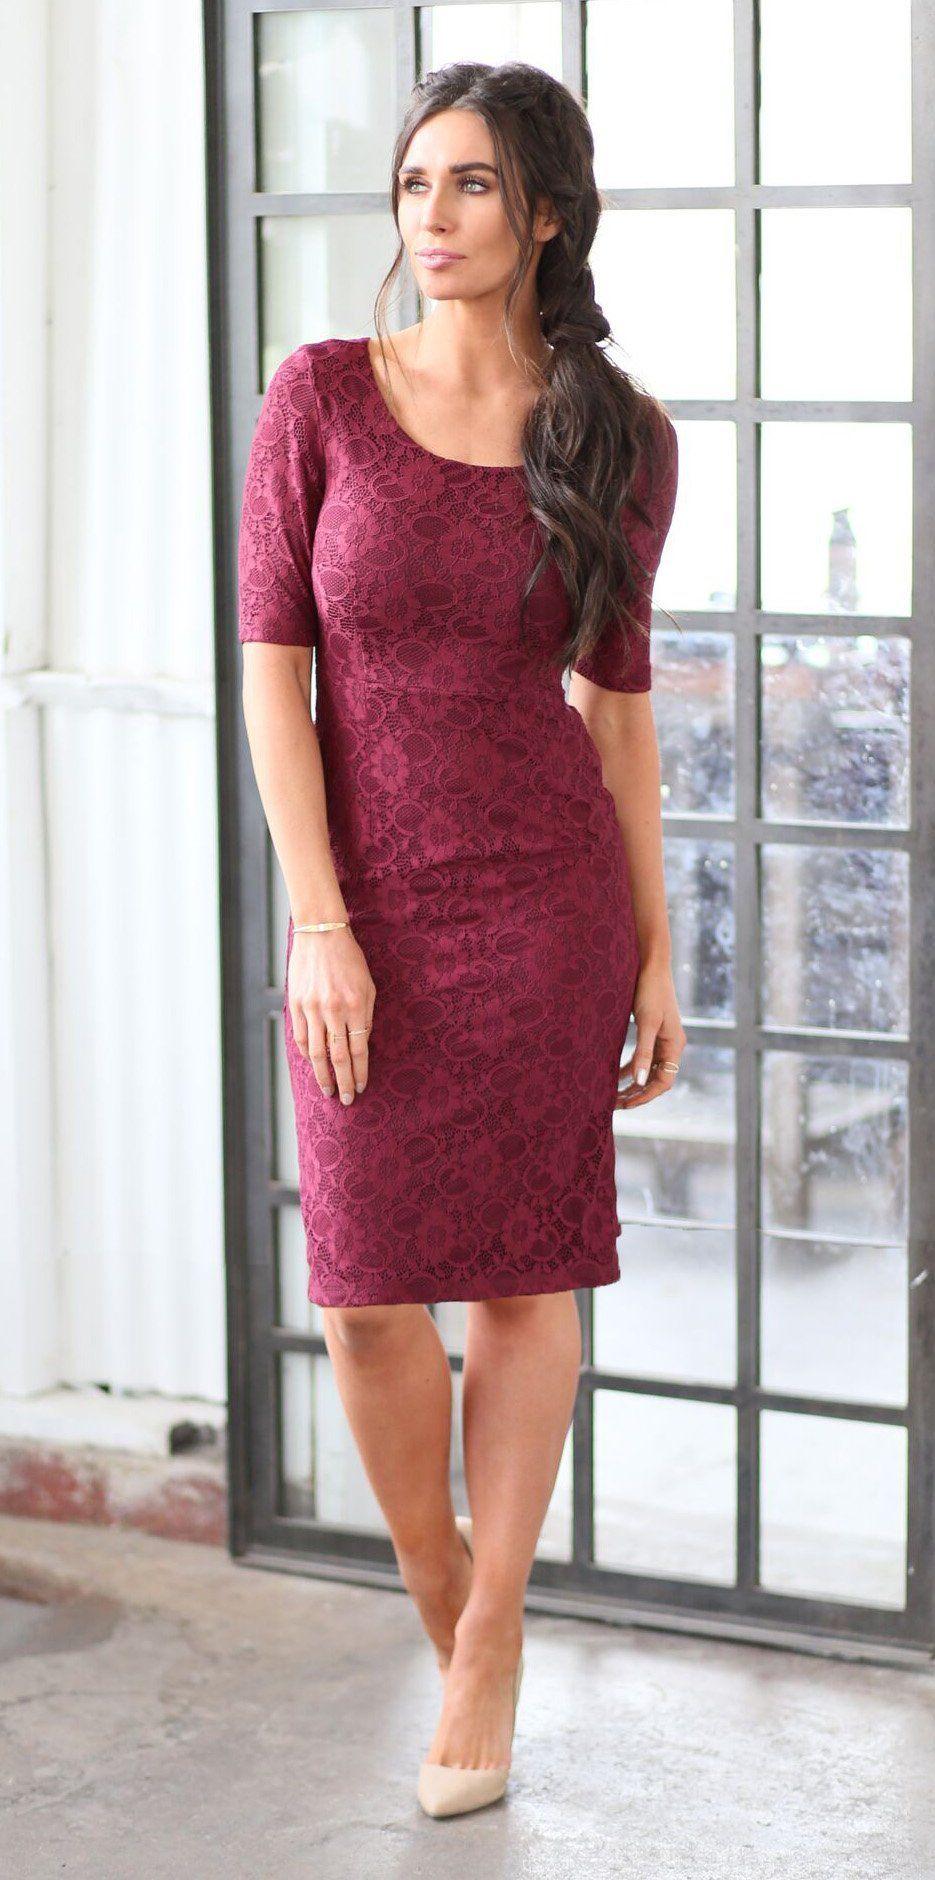 Alaina Dress (Burgundy) #businessattiresummer Modest, Cream lace dress, can be accessorized with a belt or worn alone - cute and perfect for Summer! Teacher clothing, conservative business attire. #businessattiresummer